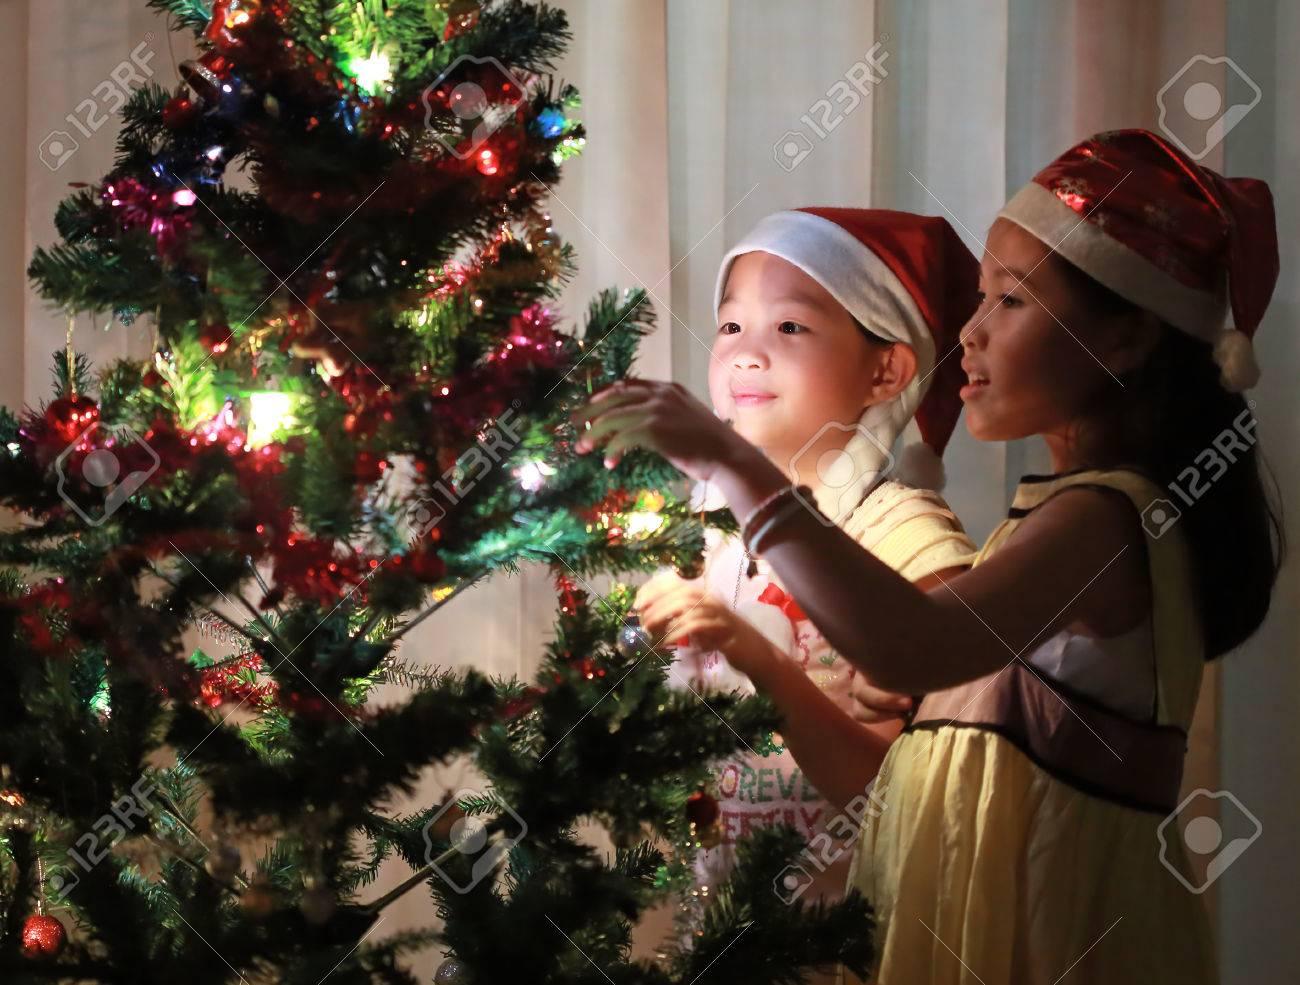 Portrait of happy girl decorating Christmas tree - 24327844